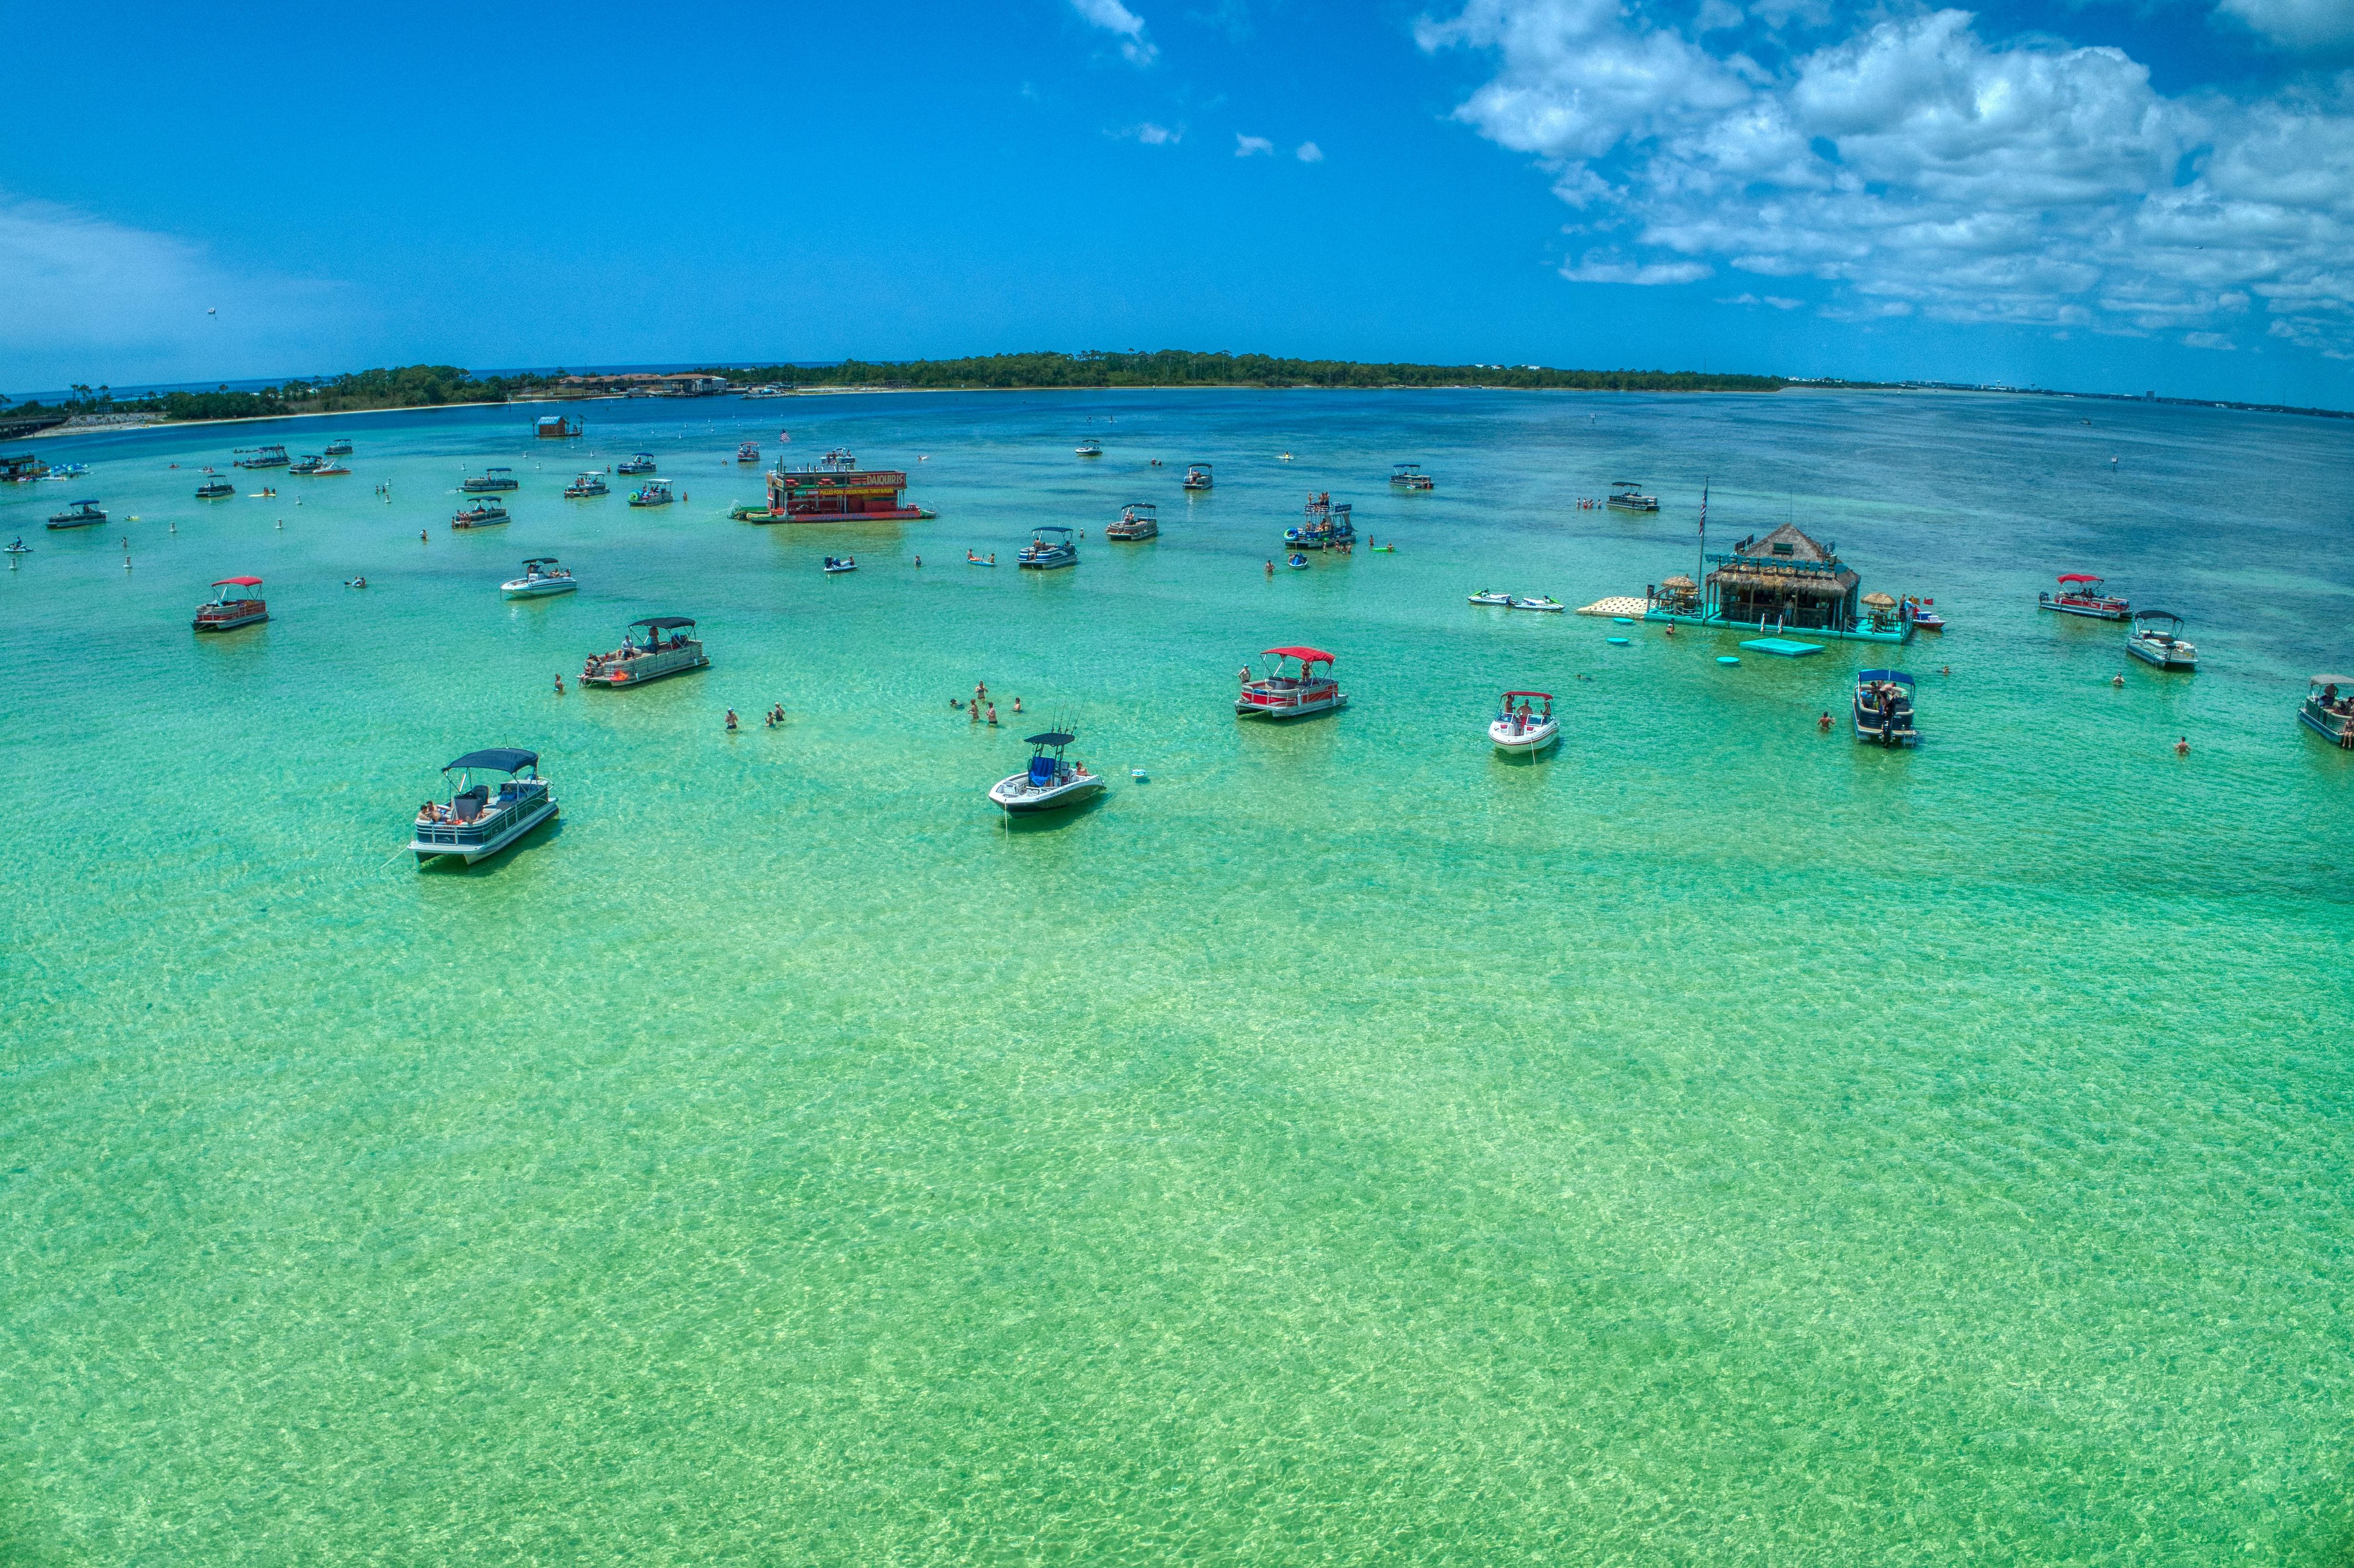 The Rental Shop 30A Boat Rental in Santa Rosa Beach Florida at crab island destin